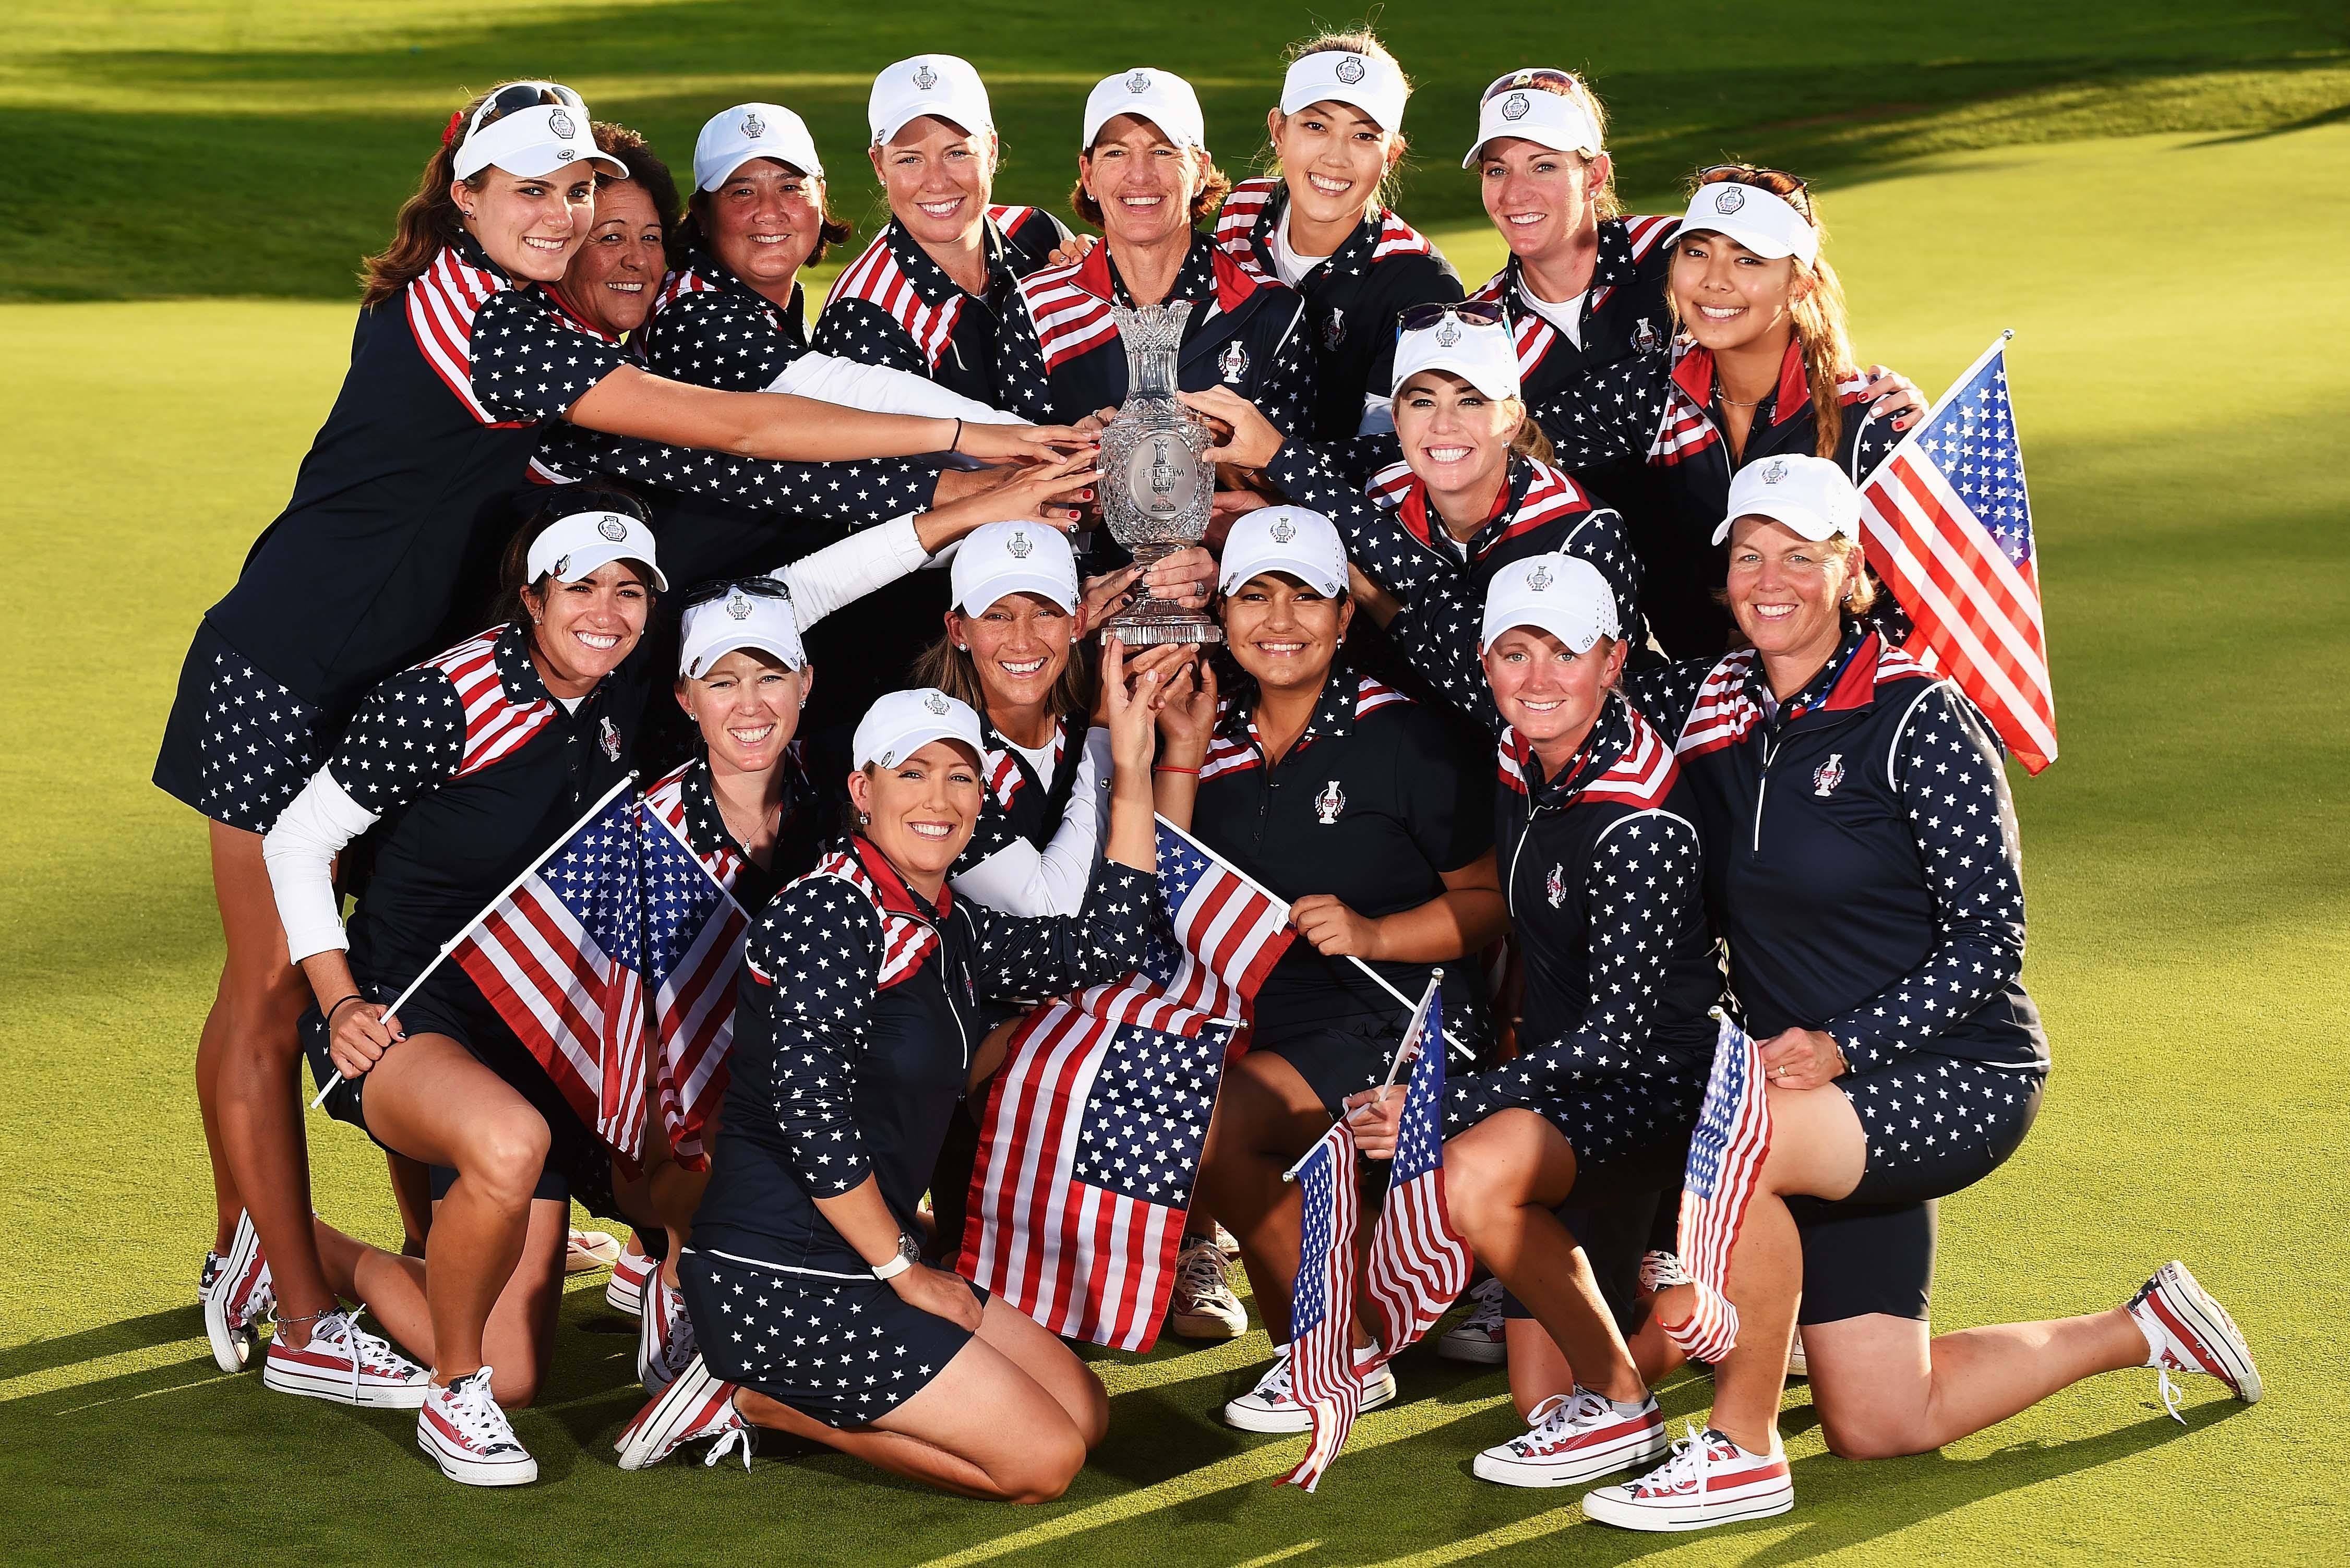 U.S. Solheim Cup team